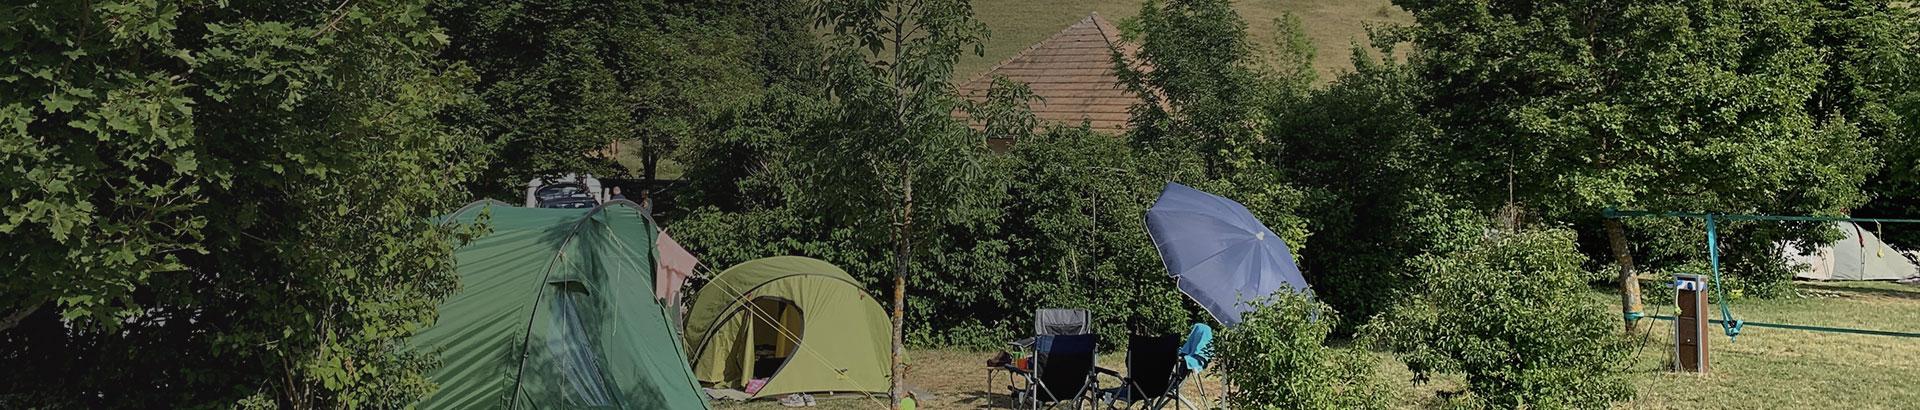 Camping Belleroche tentes